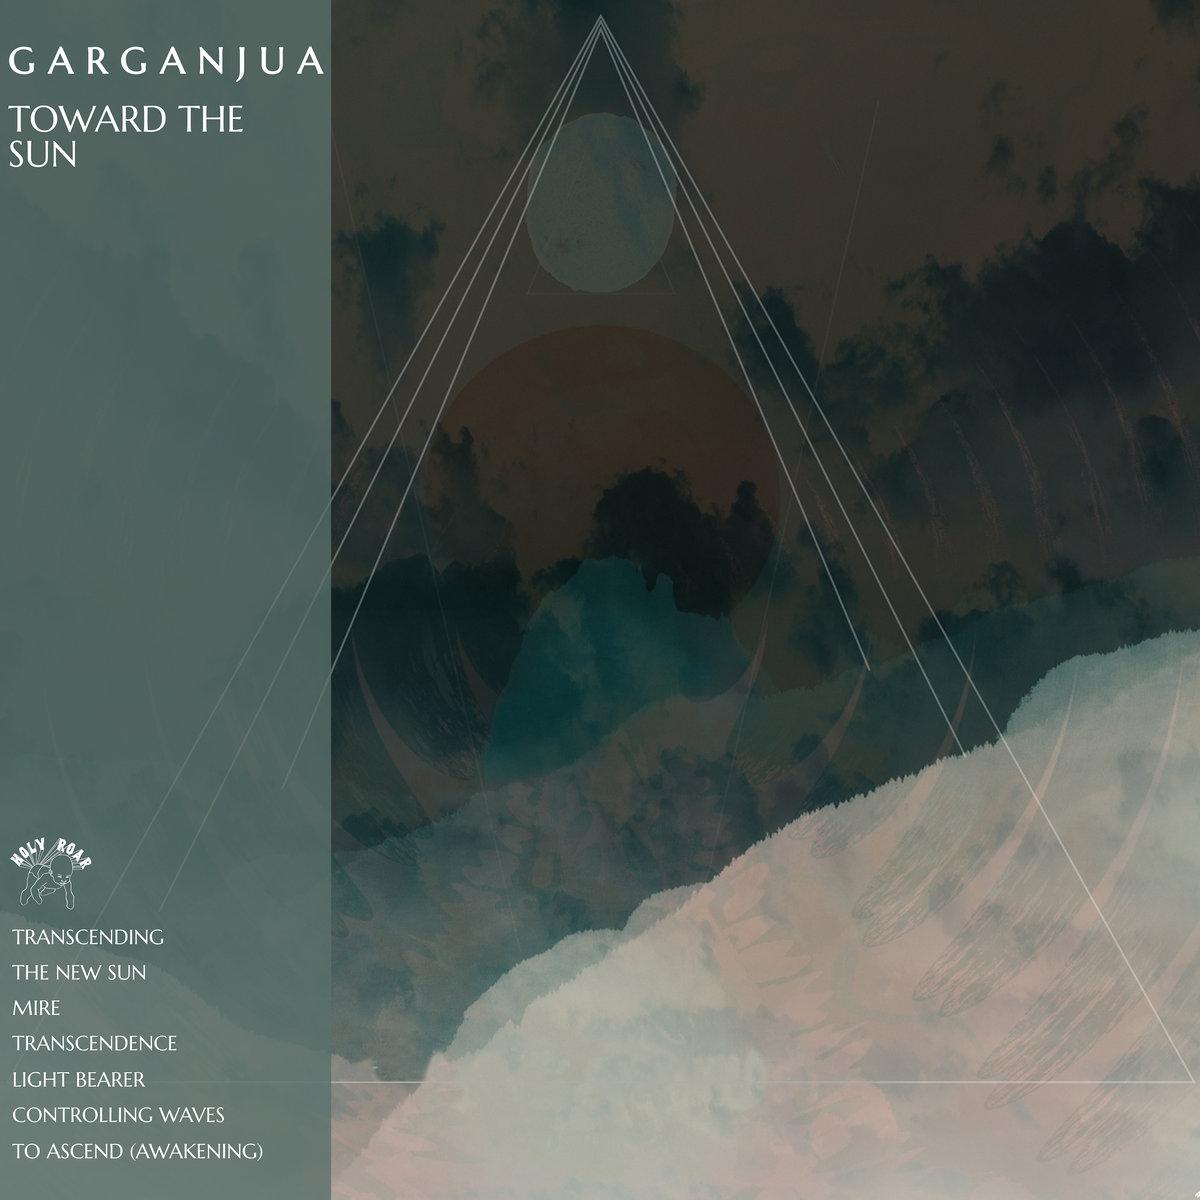 Garganjua - Toward The Sun LP